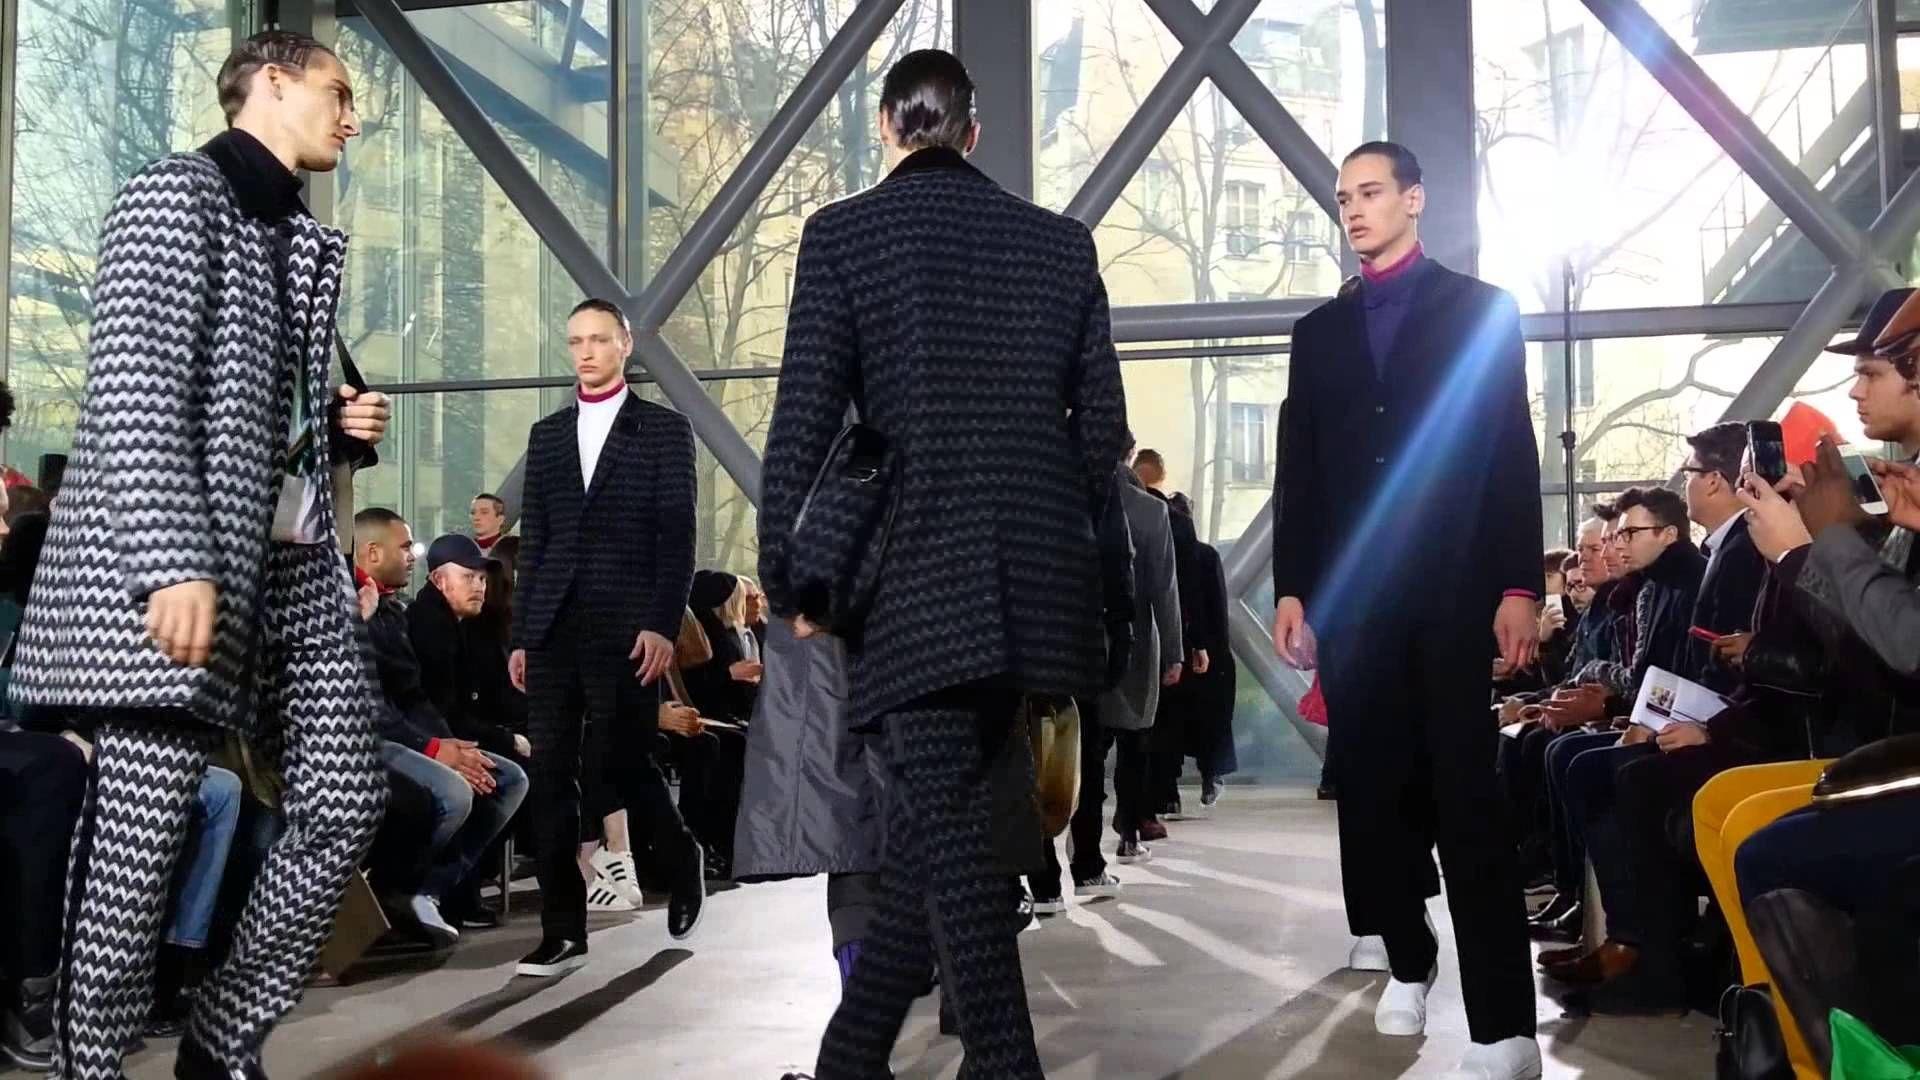 cool  #Arte #at #aw2015 #cartier #catwalk #Contemporáneo #de #desfile #fashion #Fundacion #hombre #issey #mens #mistake #miyake #moda #paris #wear #week #womanword WOMANWORD at Issey Mistake catwalk aw2015 http://www.grovefashion.com/womanword-at-issey-mistake-catwalk-aw2015/  Check more at http://www.grovefashion.com/womanword-at-issey-mistake-catwalk-aw2015/